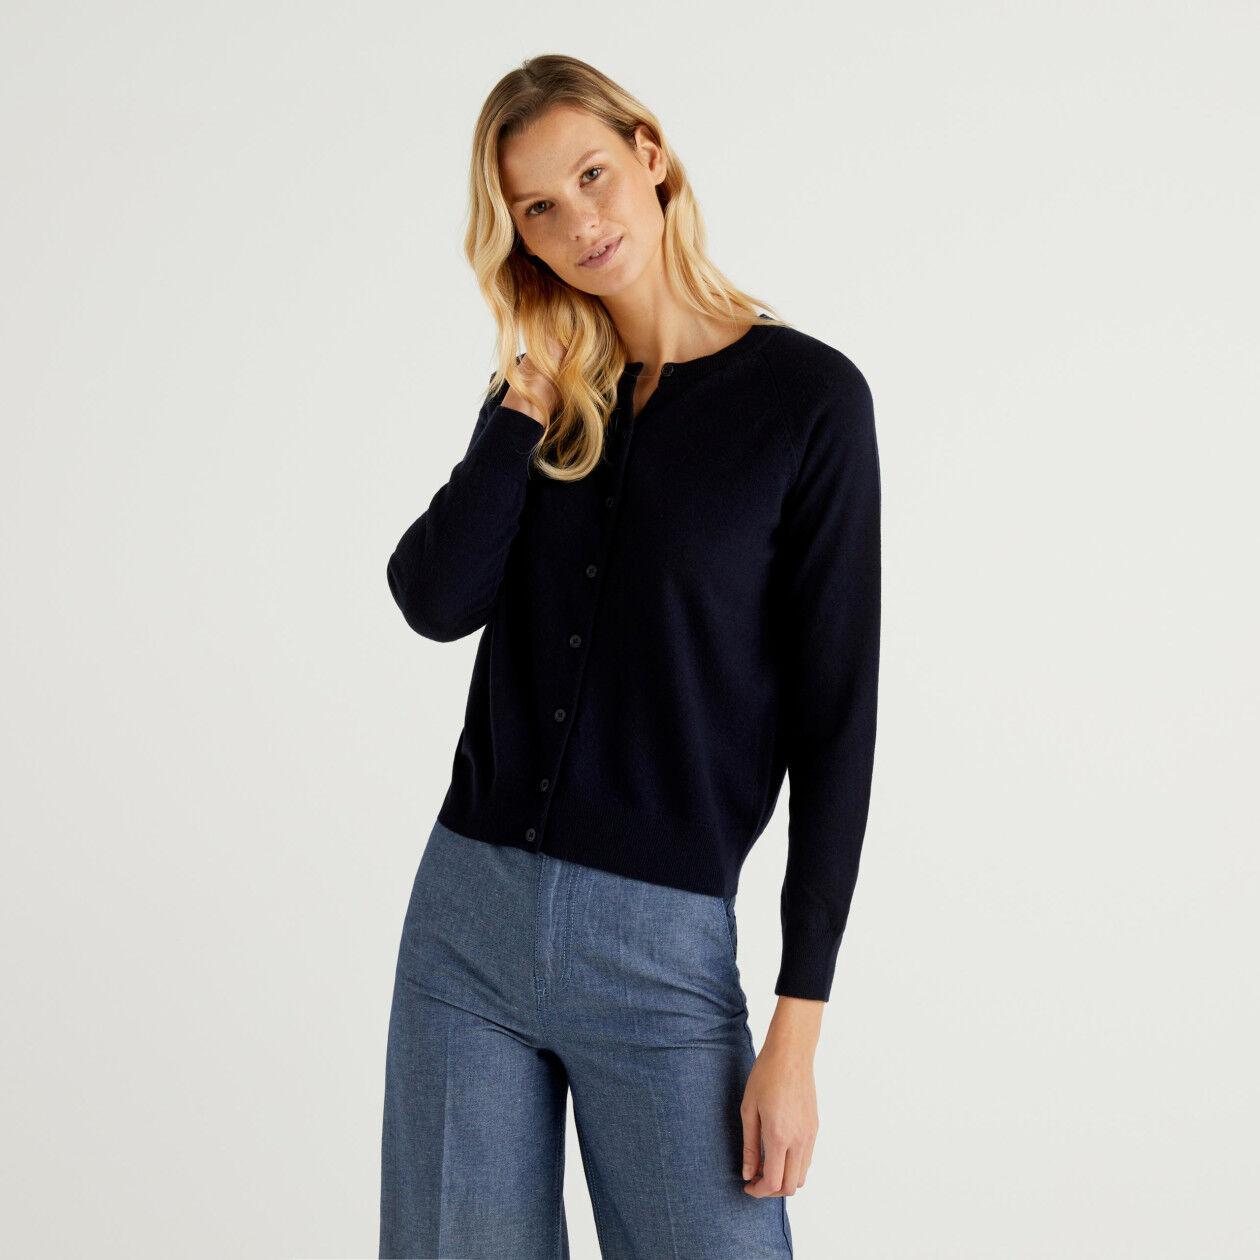 Dark blue crew neck cardigan in cashmere and wool blend